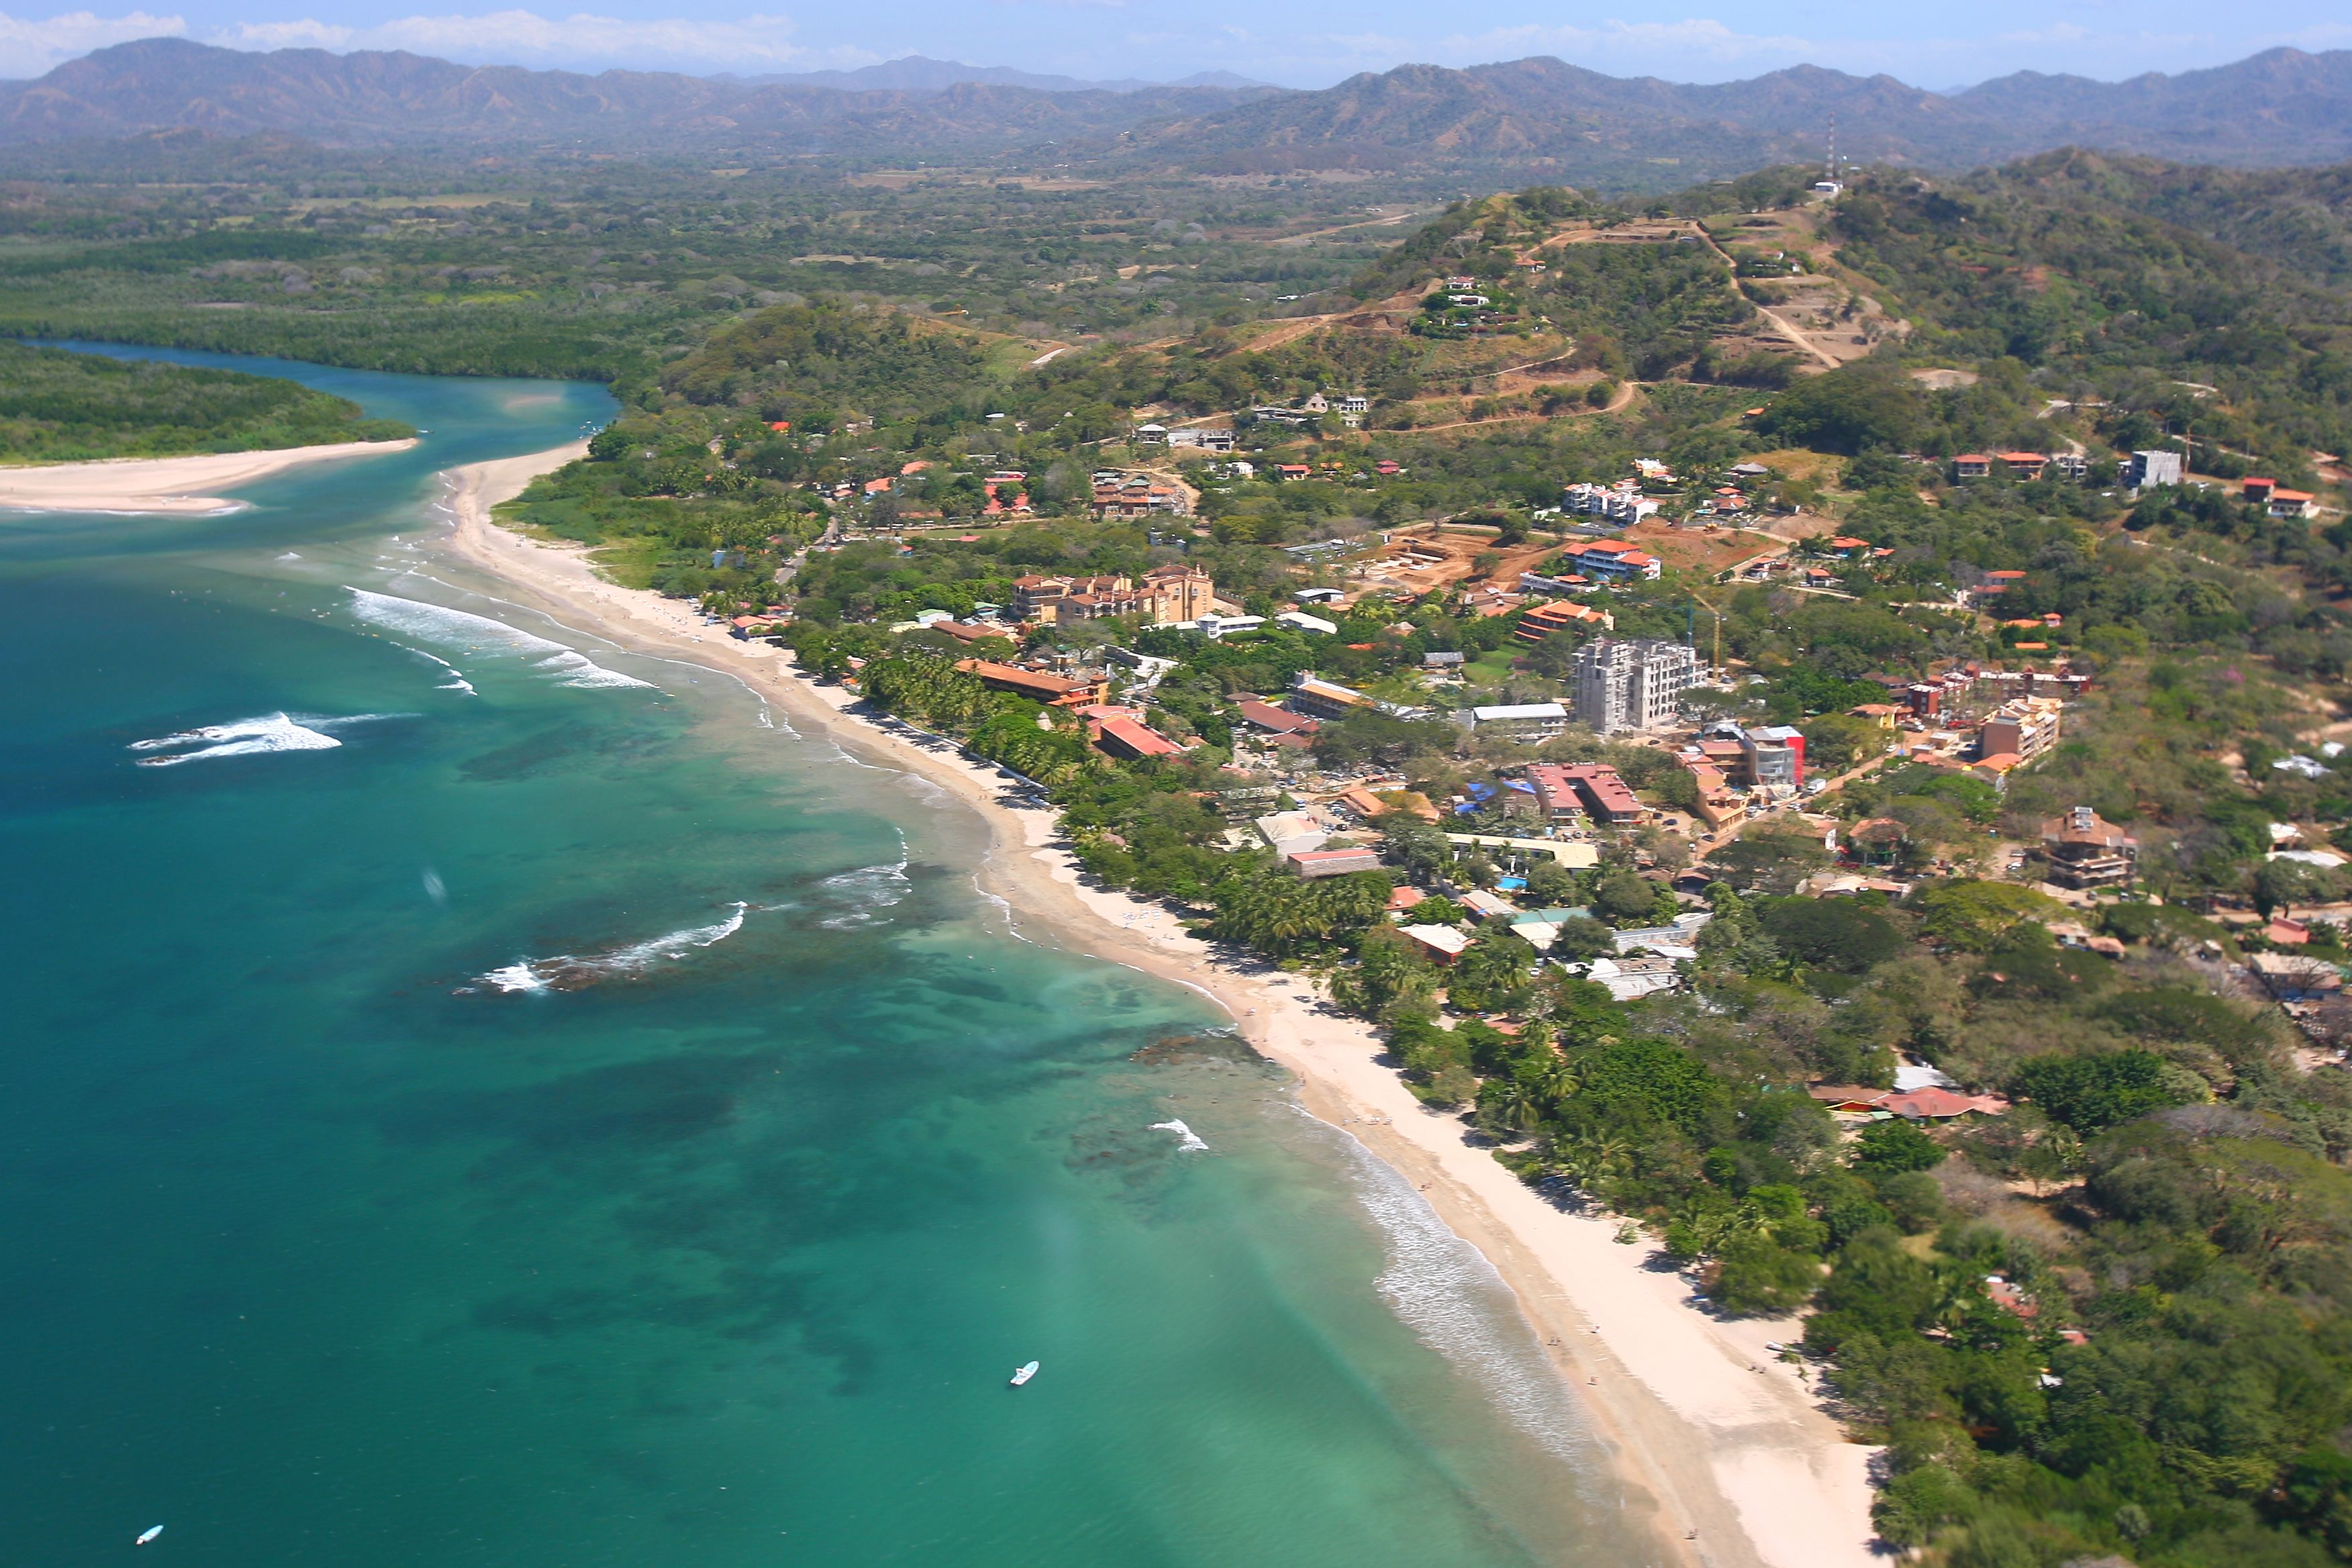 Surfing Tamarindo Costa Rica – Wave Tribe | Share The Stoke